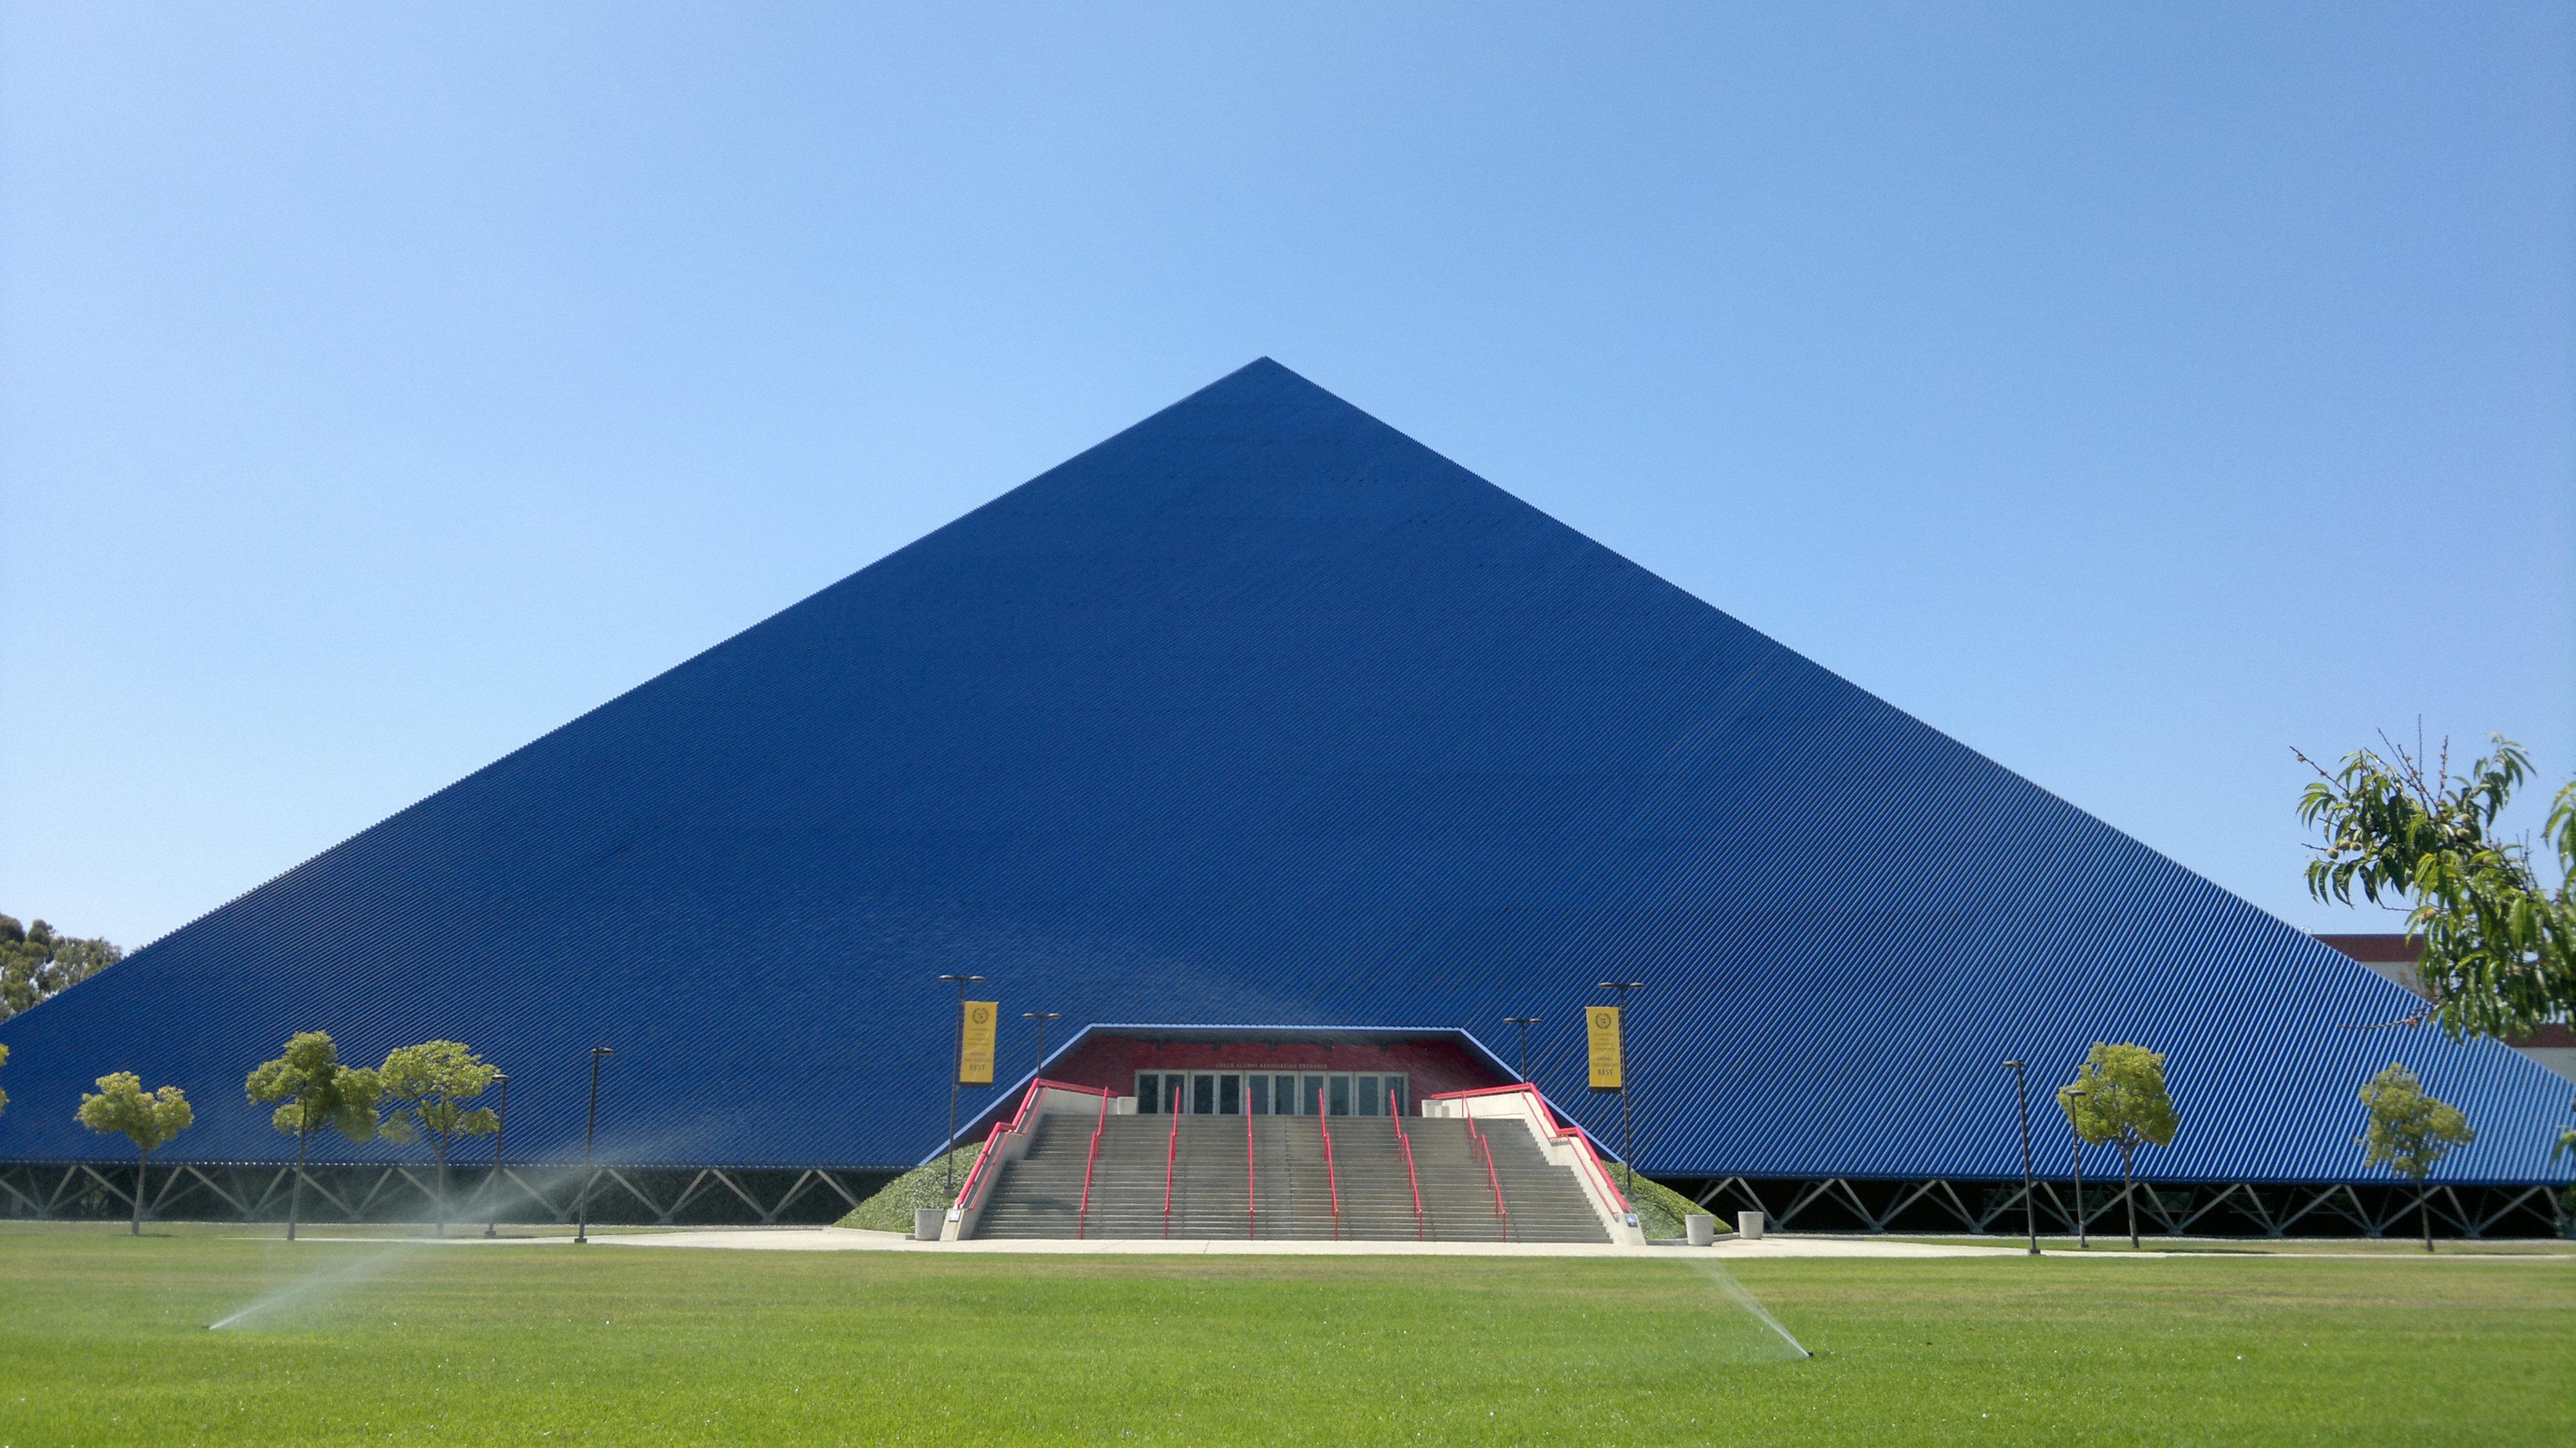 CSULB Pyramid